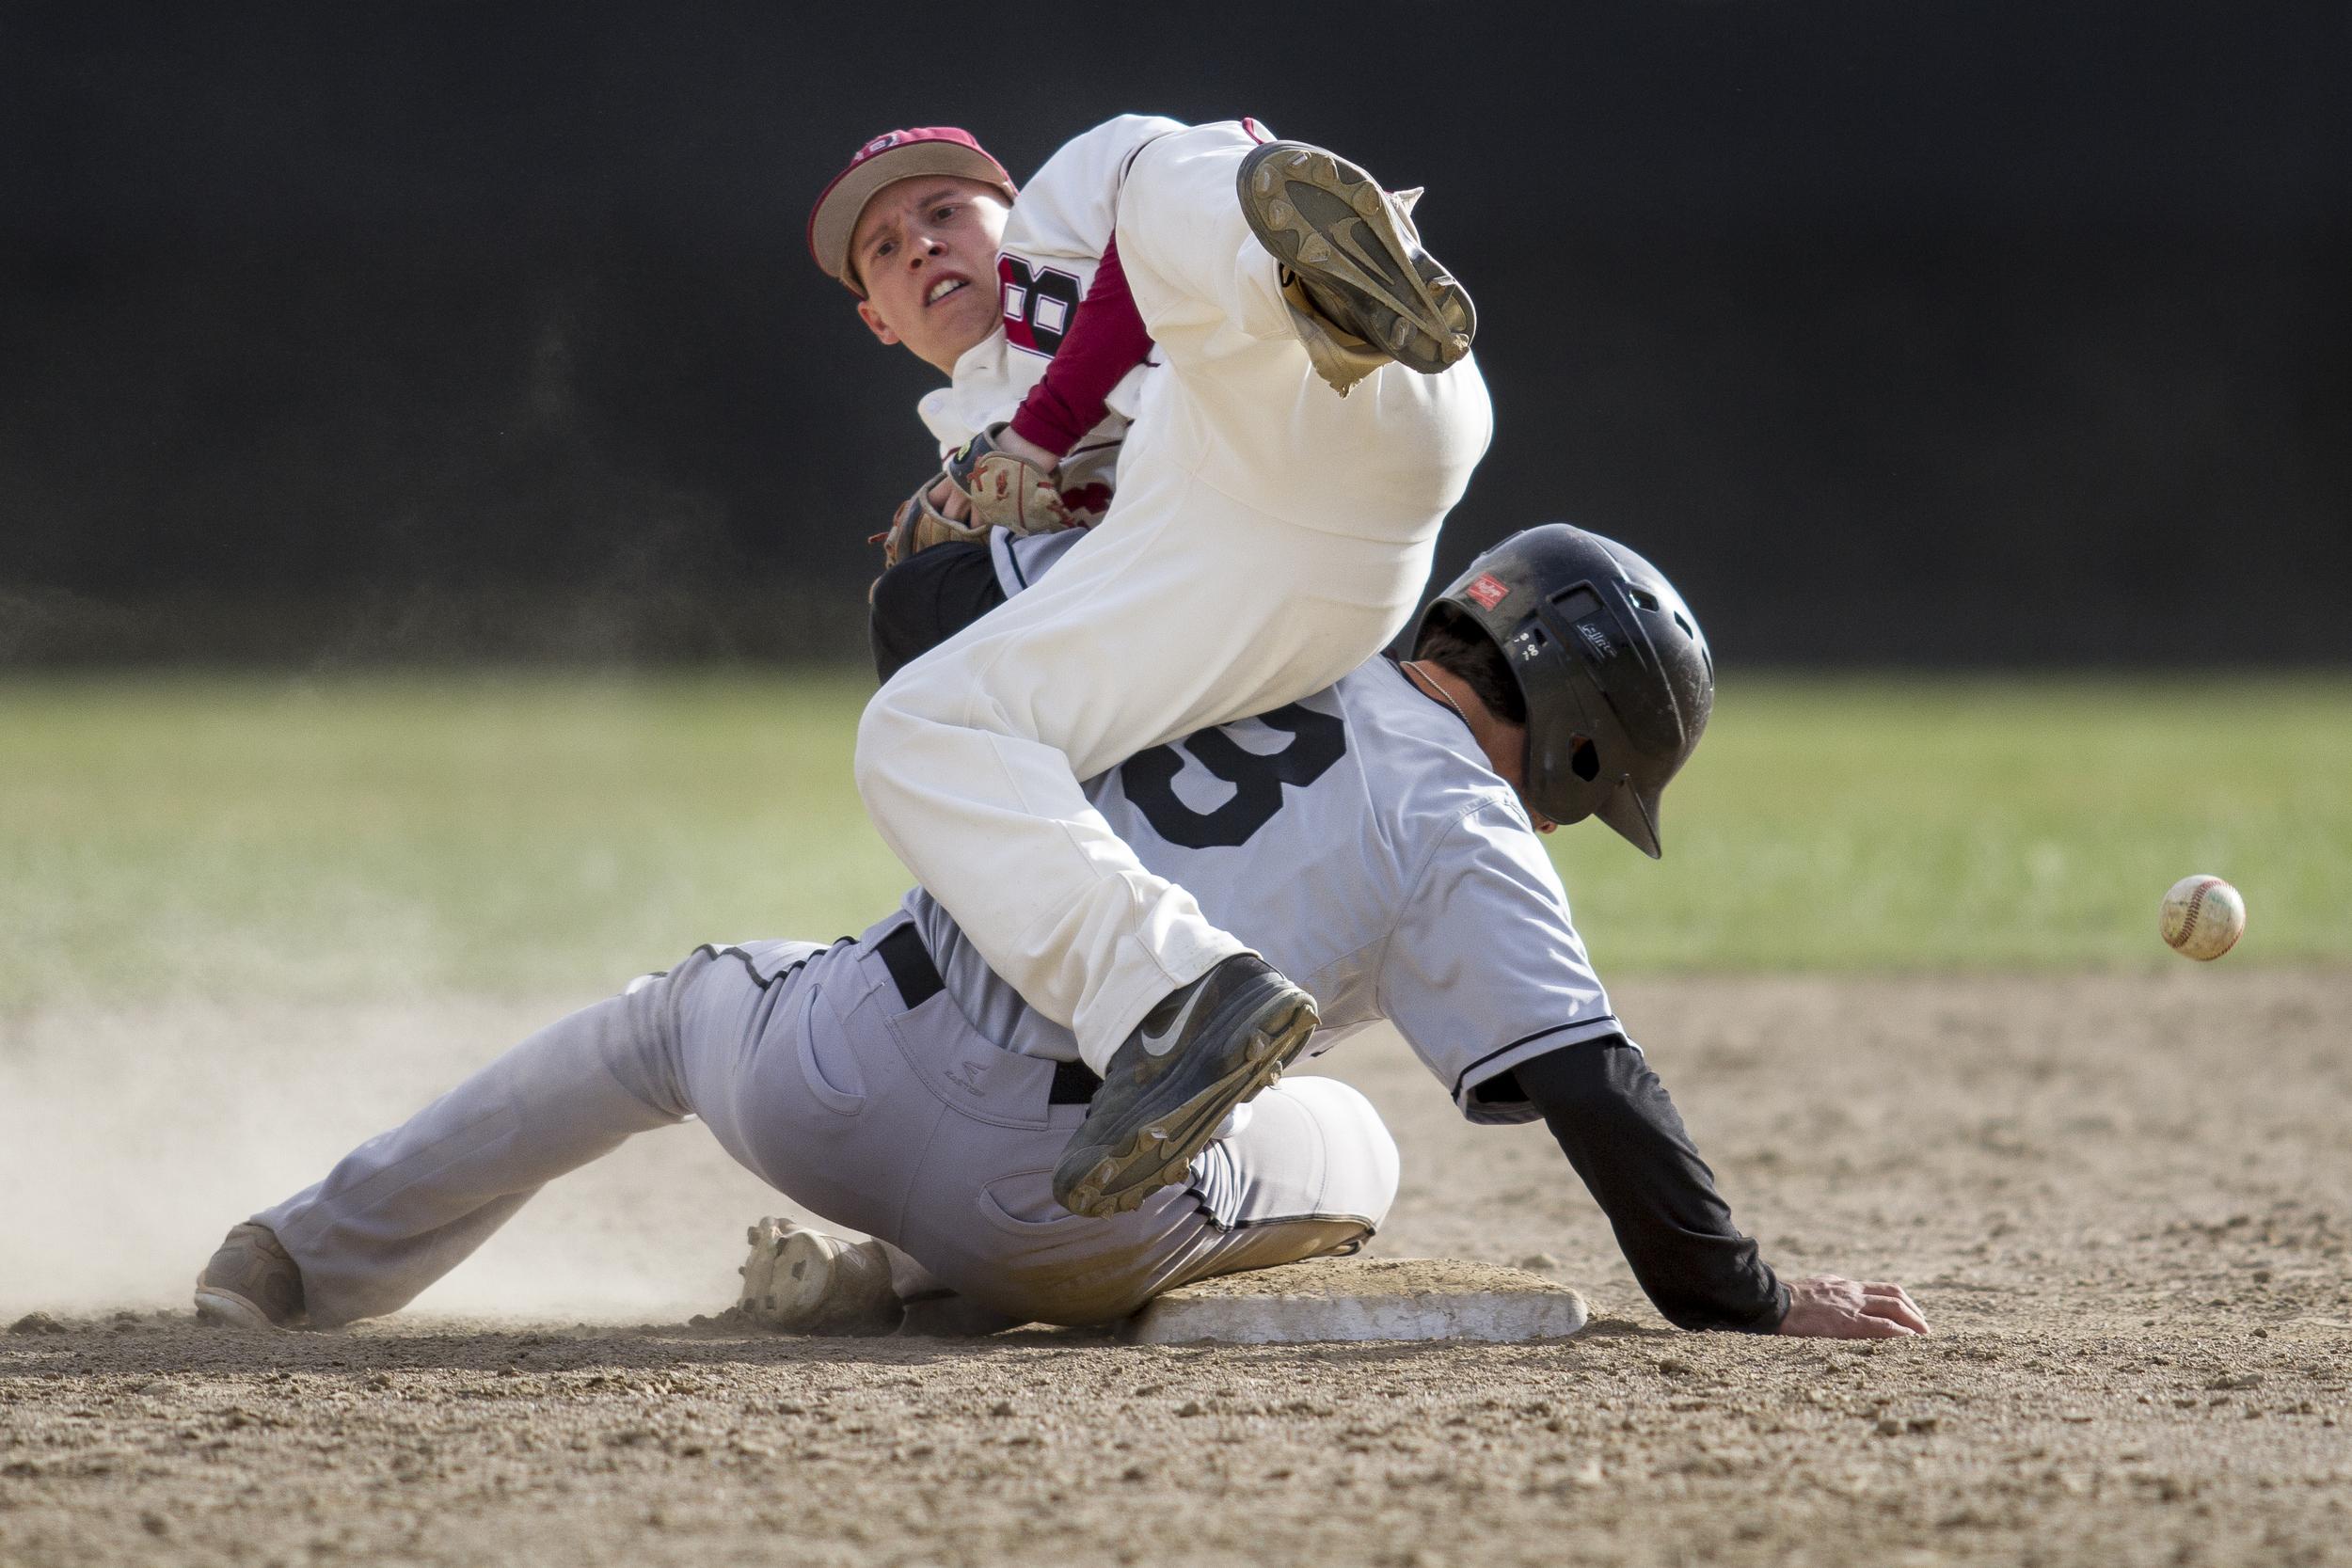 Bowdoin breaks up a double play as shortstop Brendan Fox '17 loses the ball.